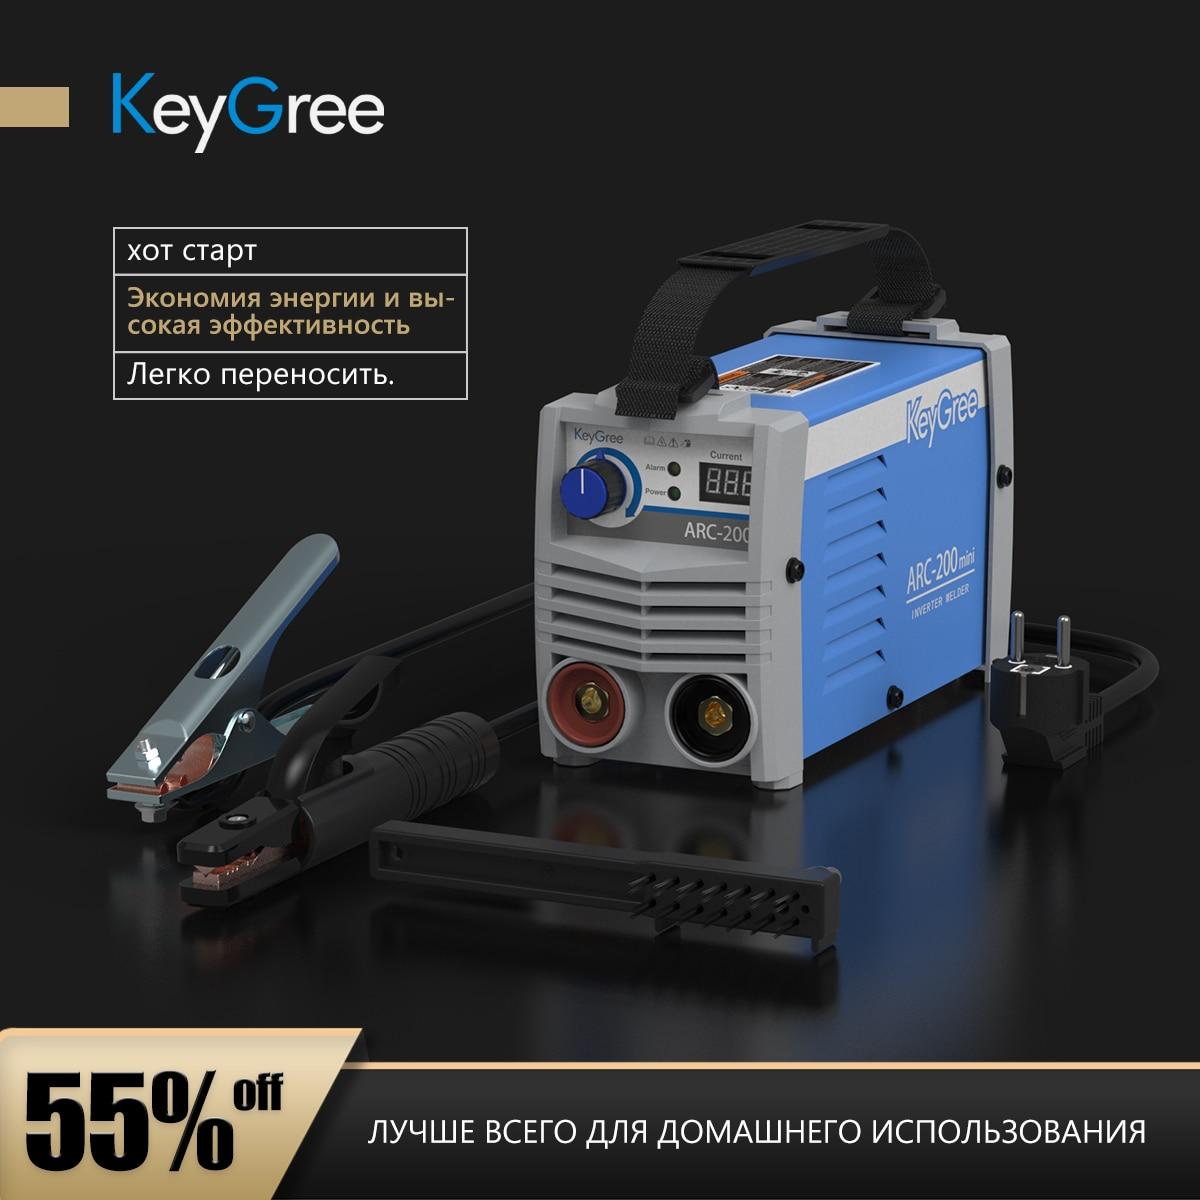 KeyGree اليورو جودة ماكينة لحام ARC صغيرة مرحلة واحدة 220 فولت العاكس MMA المحمولة لحام ARC200/220/240 آلة لحام صغيرة